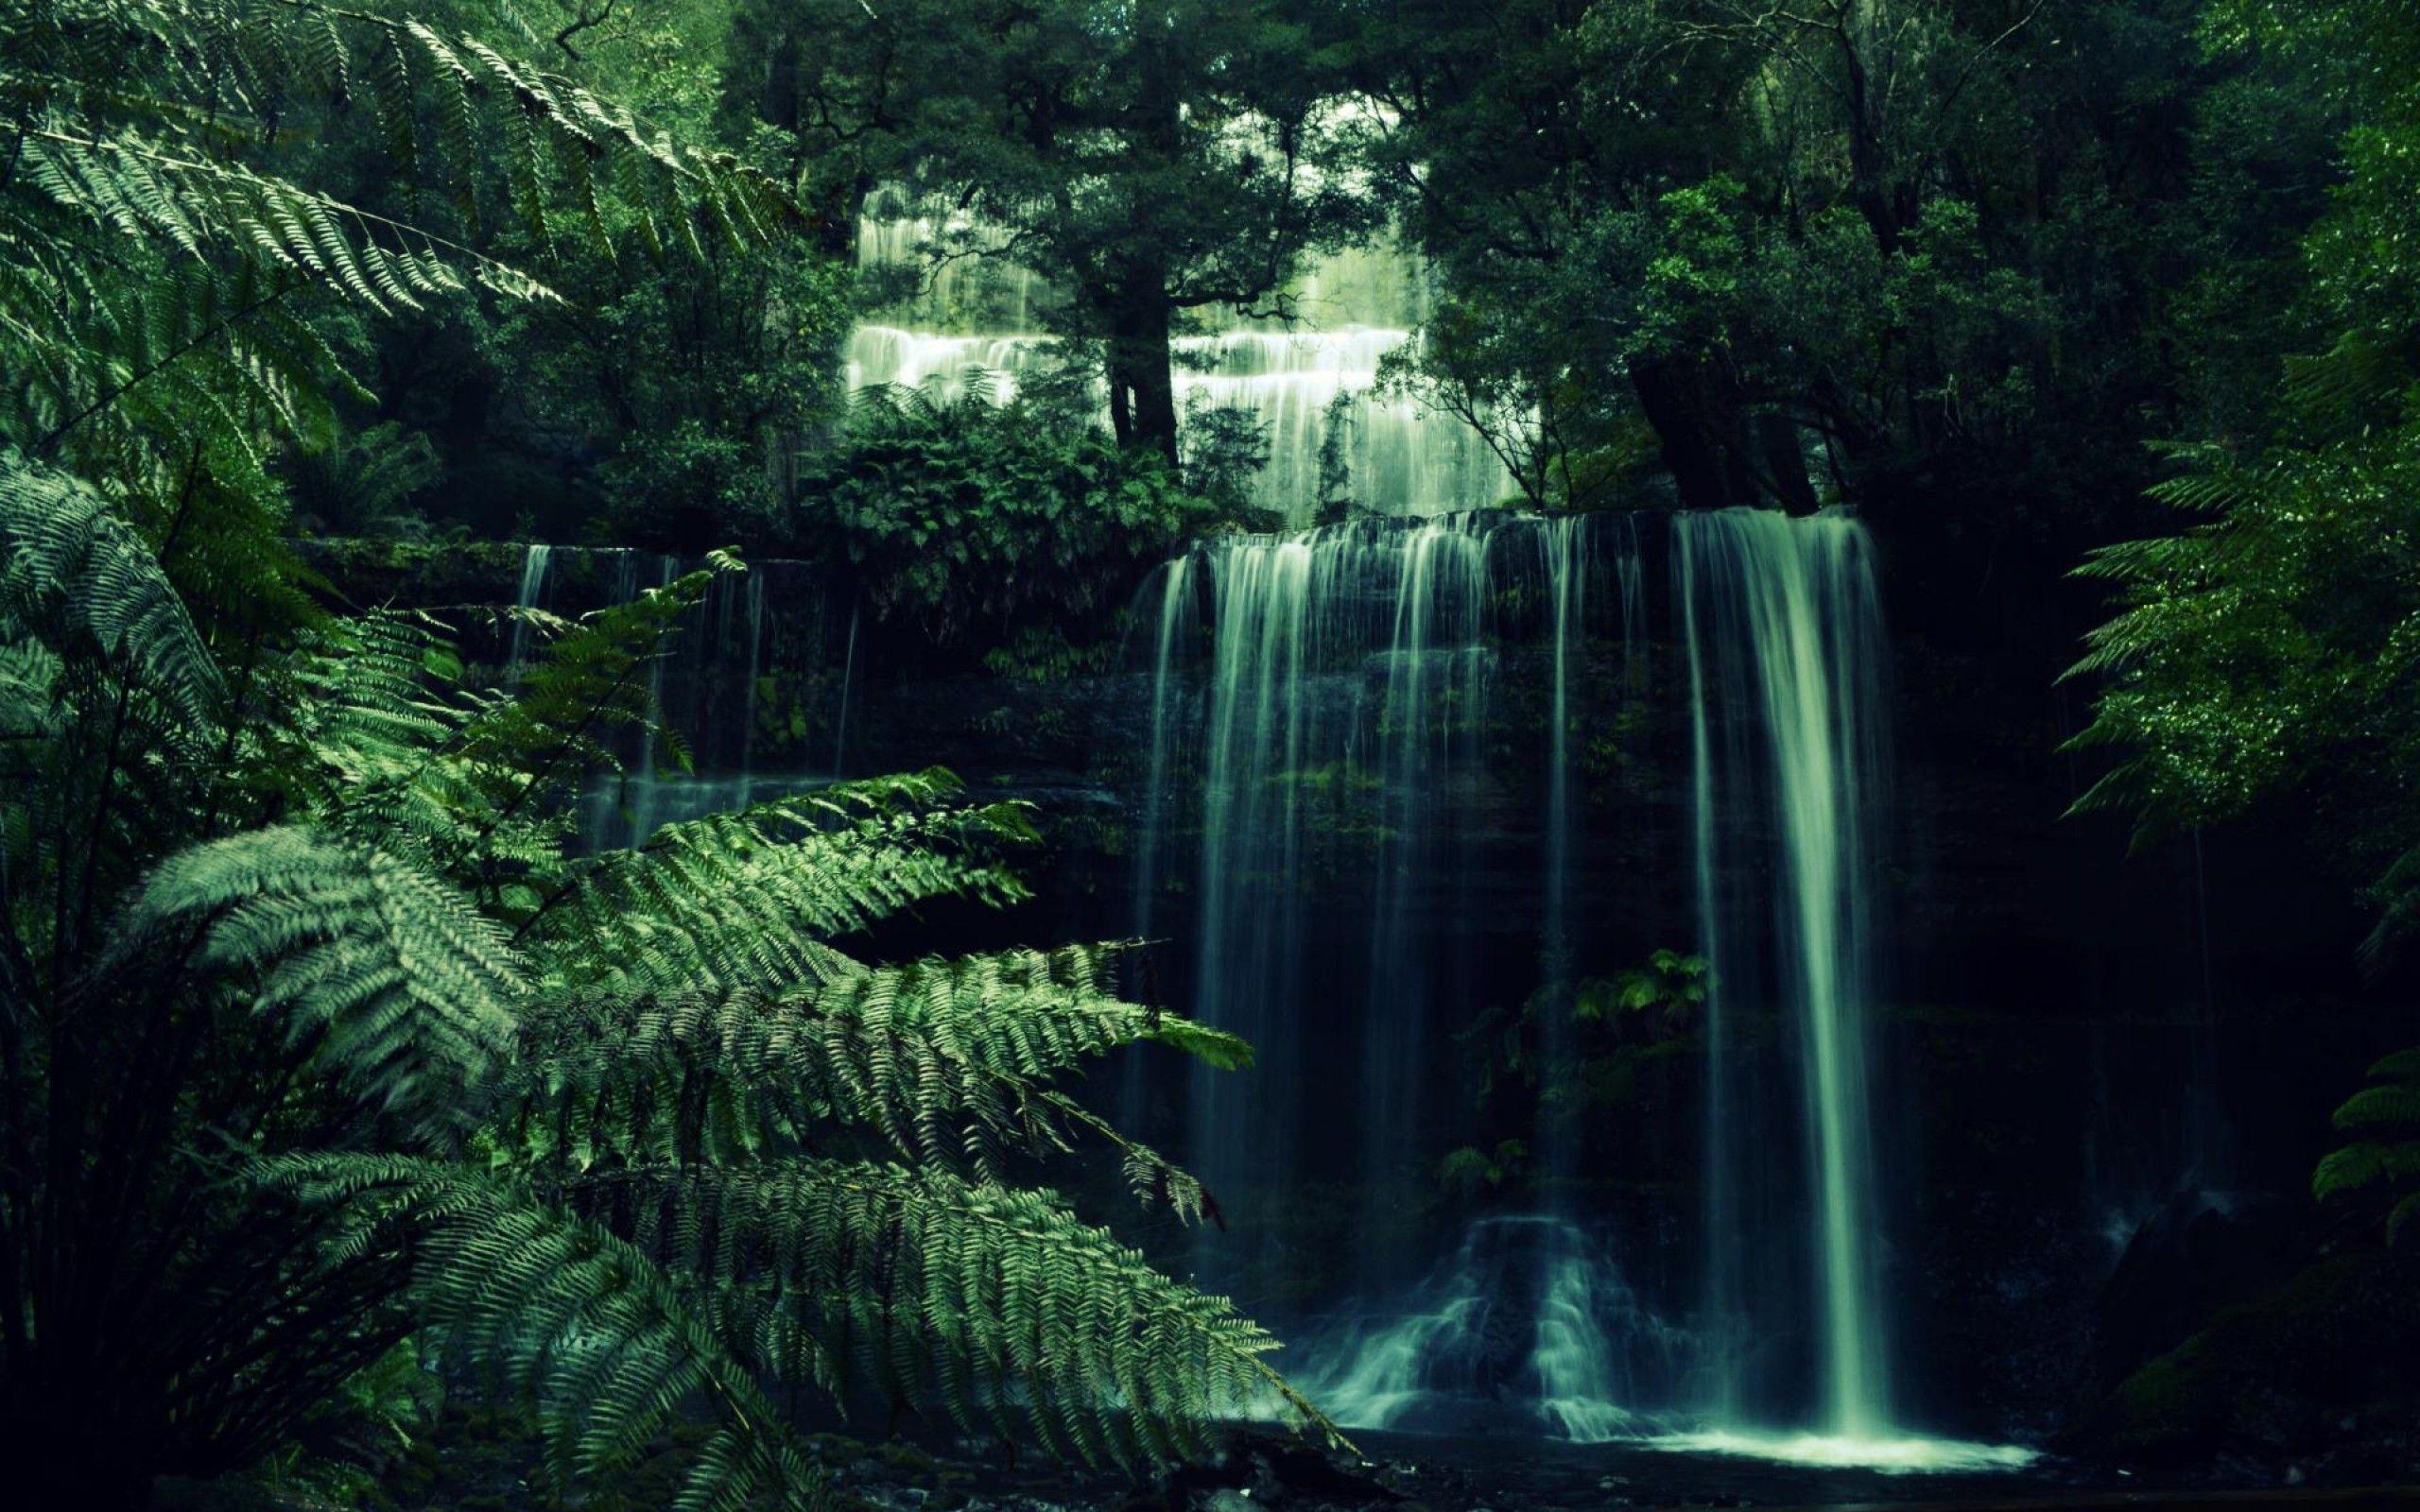 Jungle Waterfall Wallpaper Hd: Forest Waterfall Wallpapers